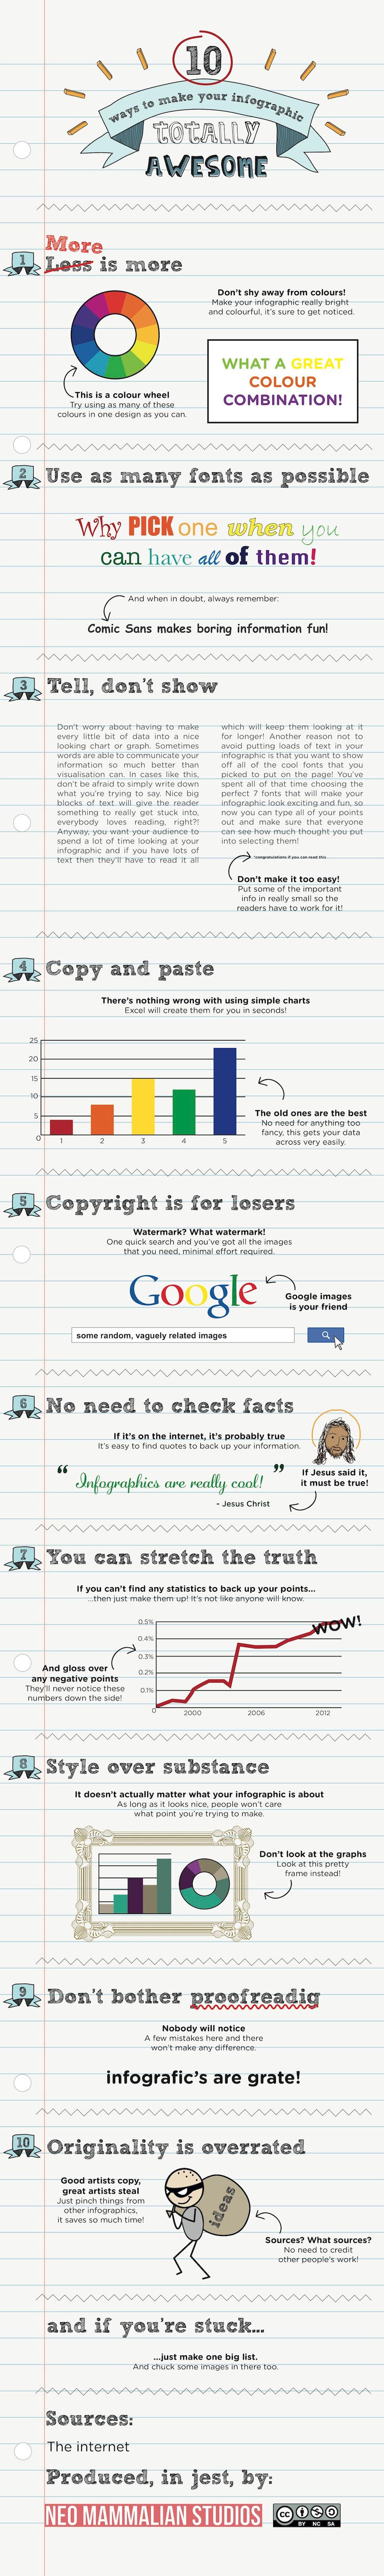 10 Sarcastic Ways To Make Infographics Impressive [Infographic]